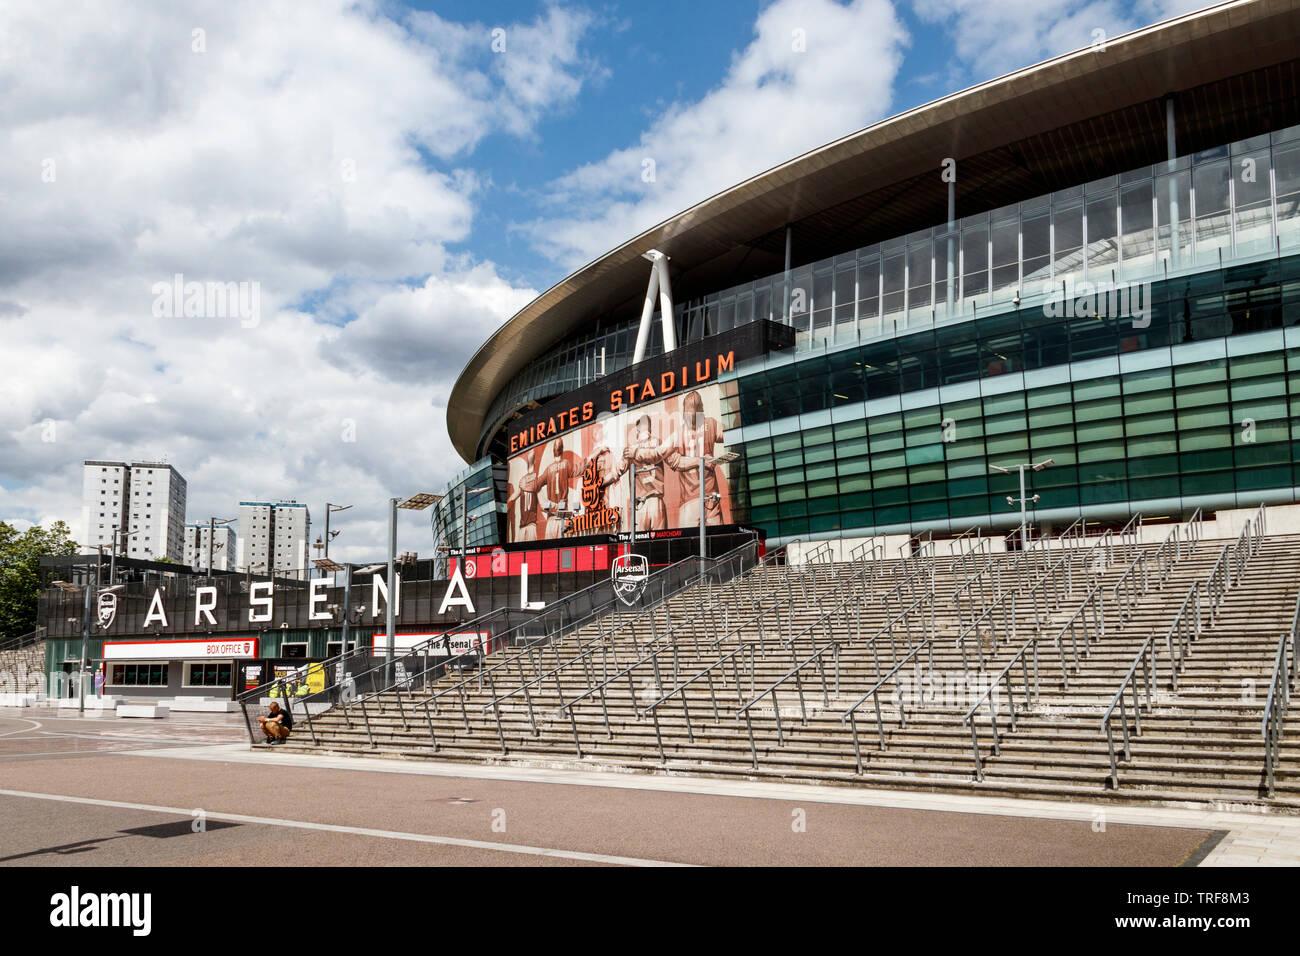 The Emirates Stadium, home to Arsenal Football Club, Islington, London, UK, 2019 Stock Photo